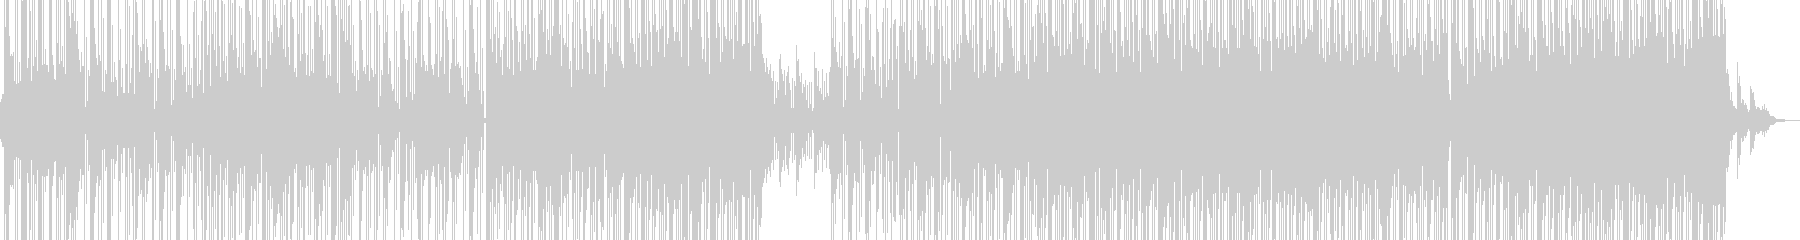 Saxophone, mellow air, R & B short +'s unreproduced waveform